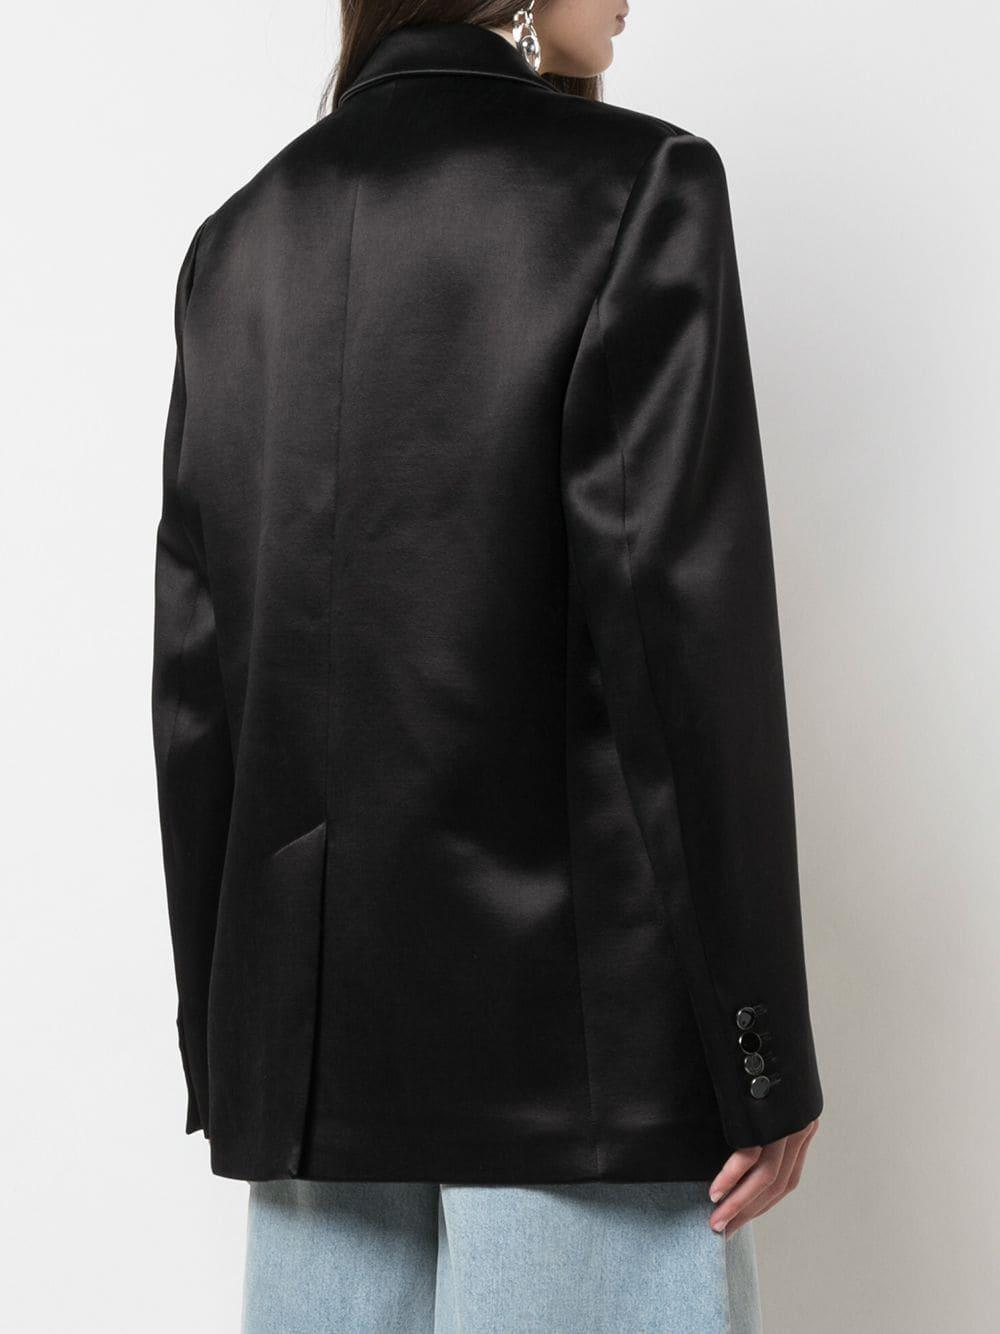 Blazer oversize Off-White c/o Virgil Abloh de Raso de color Negro